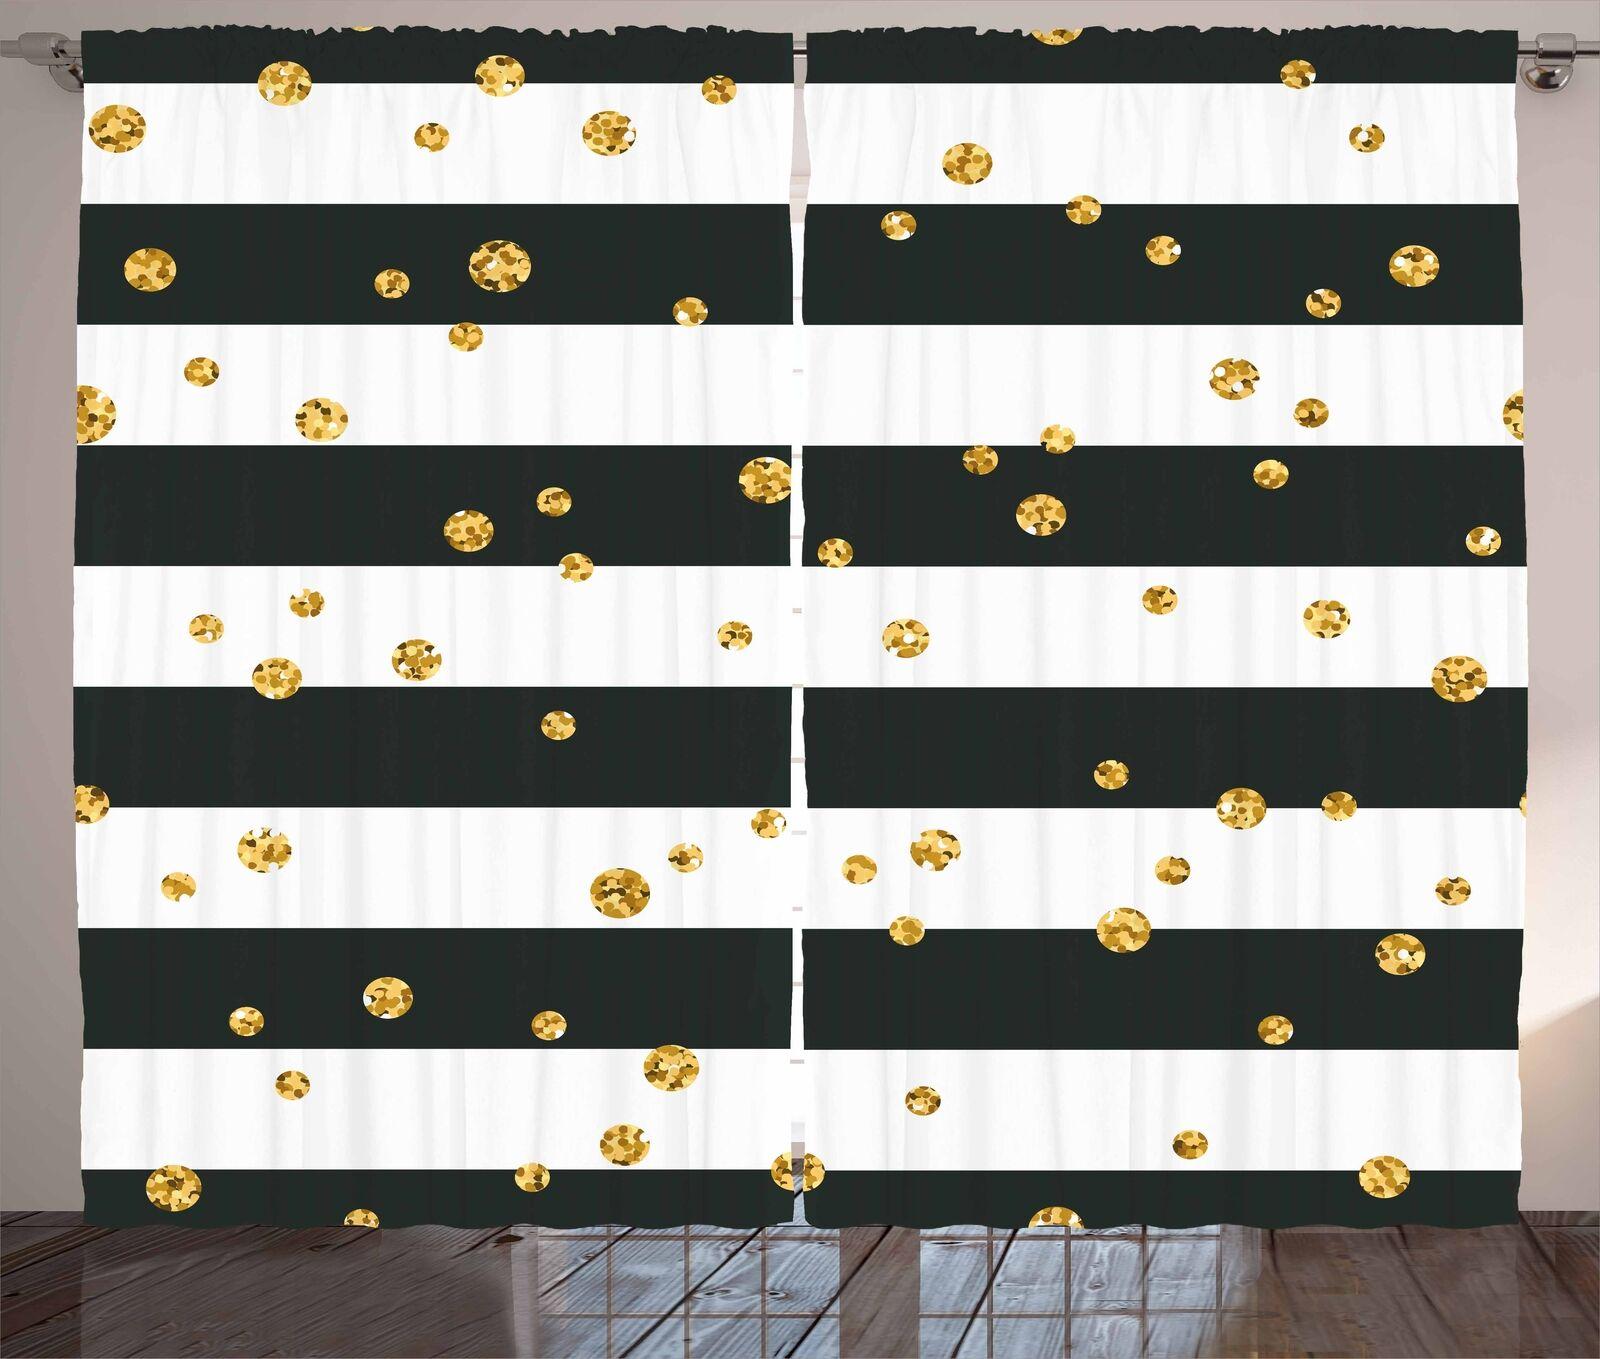 Cortinas blancoo y oro líneas audaces puntos Ventana Cortinas 2 pulgadas Panel Set 108x84